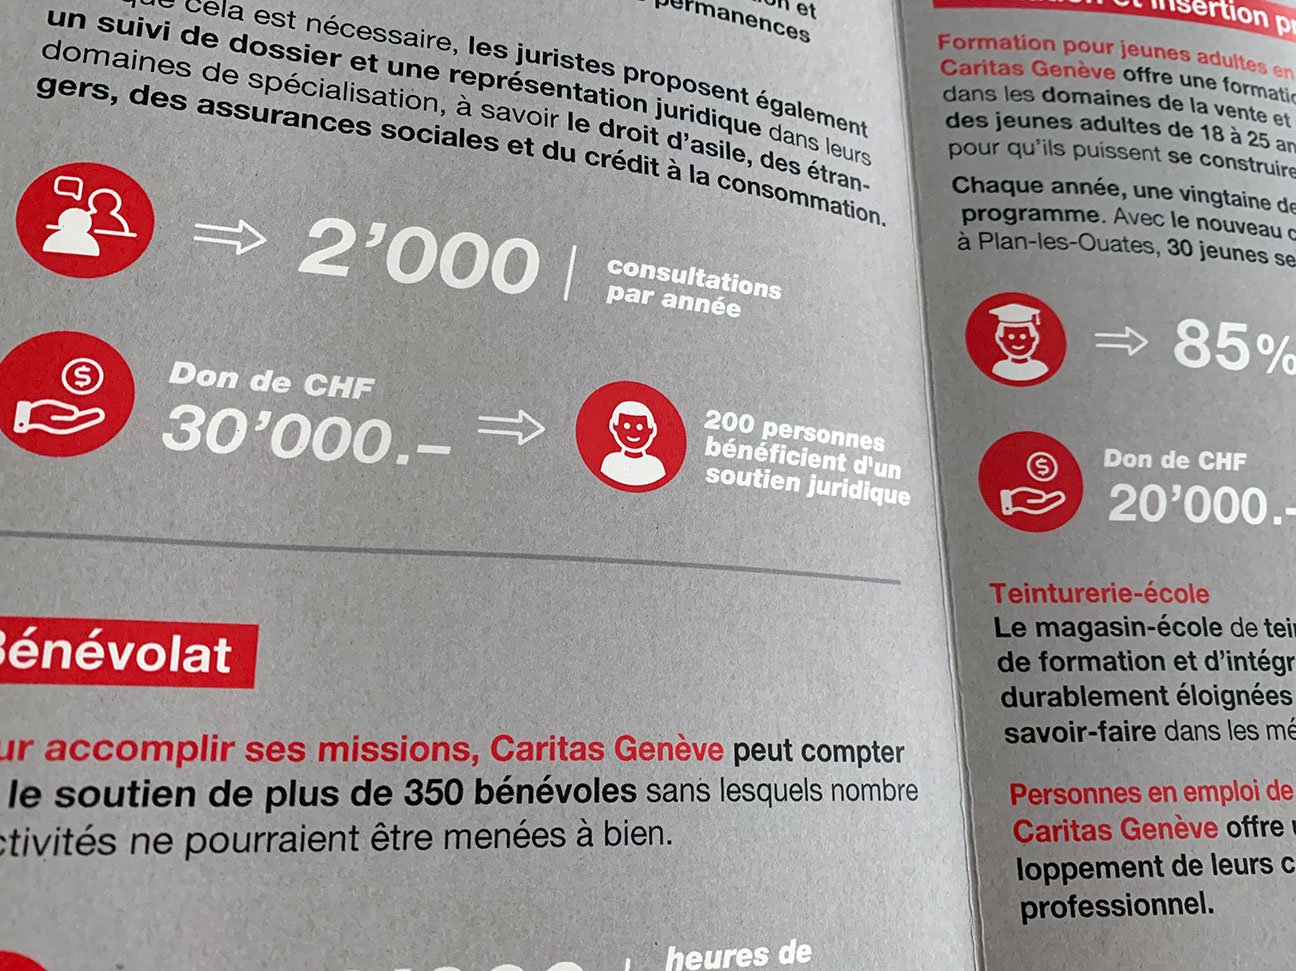 fabien_cuffel_graphisme_typographie_Brochure_Caritas_zoom_Geneve